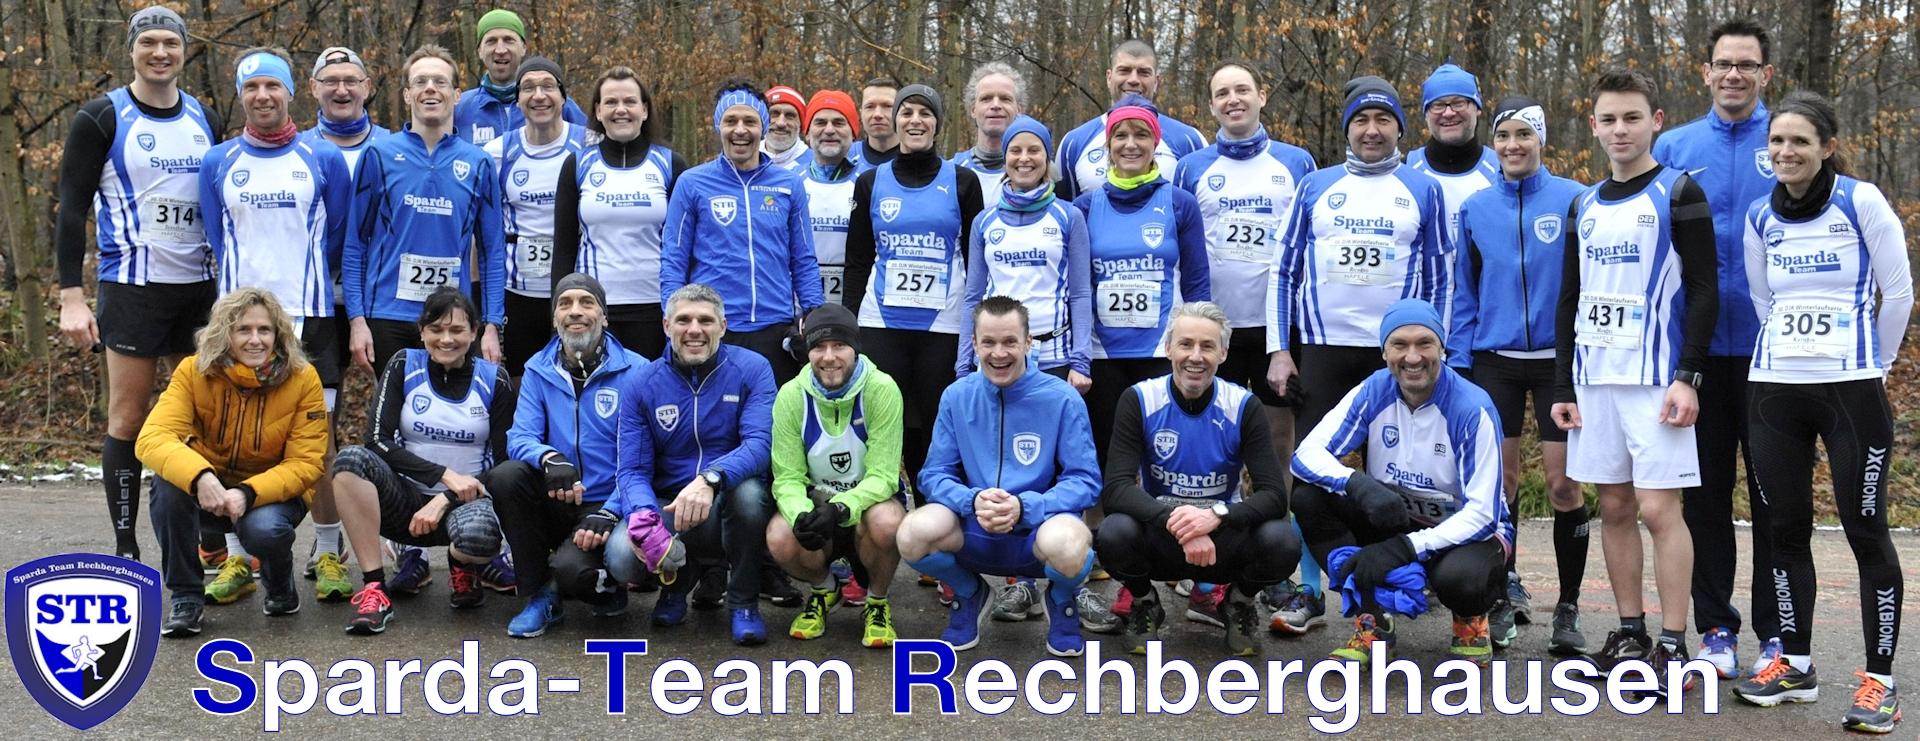 Sparda-Team Rechberghausen